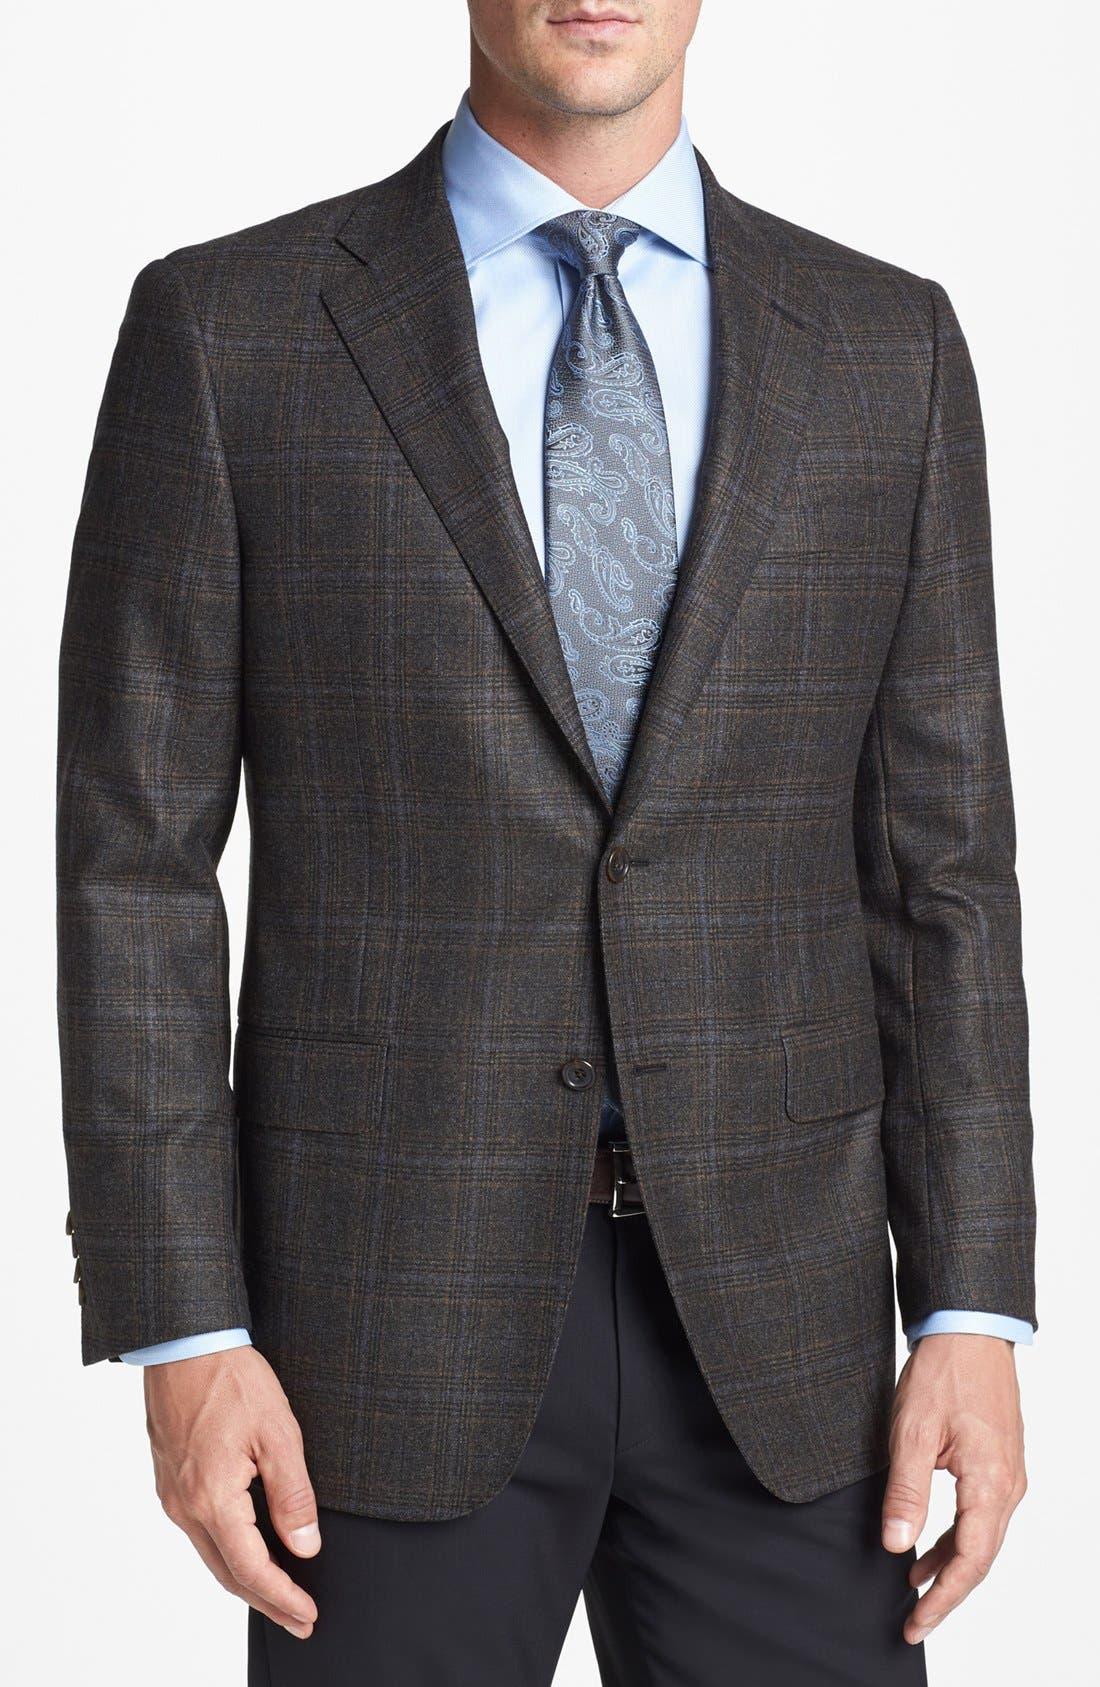 Main Image - Hickey Freeman 'B Series' Classic Fit Plaid Sportcoat